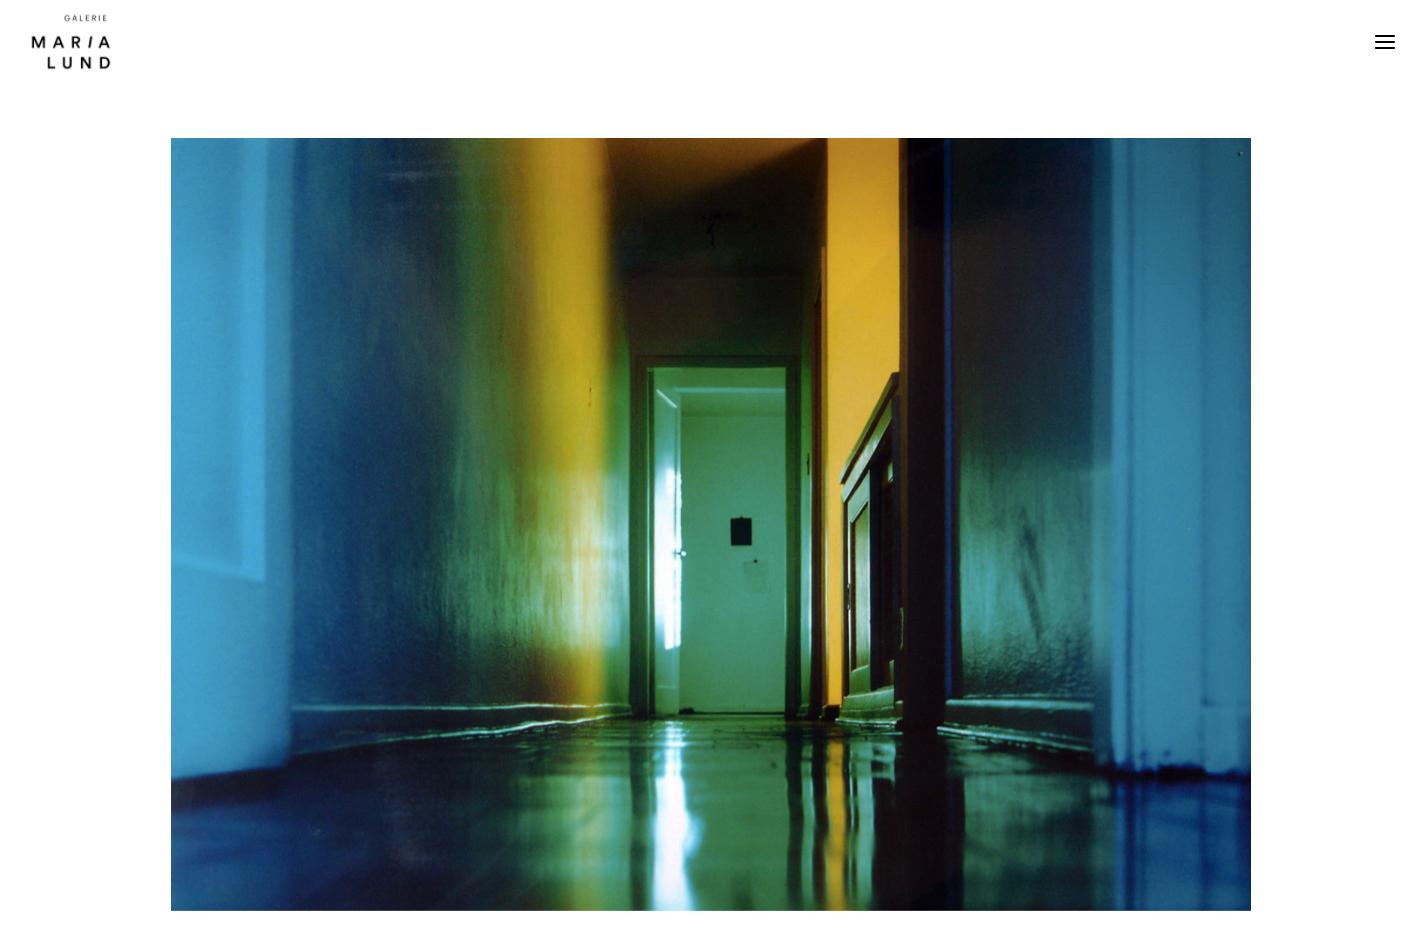 Refonte de site Galerie MariaLund - Peter Neuchsé - In blossom